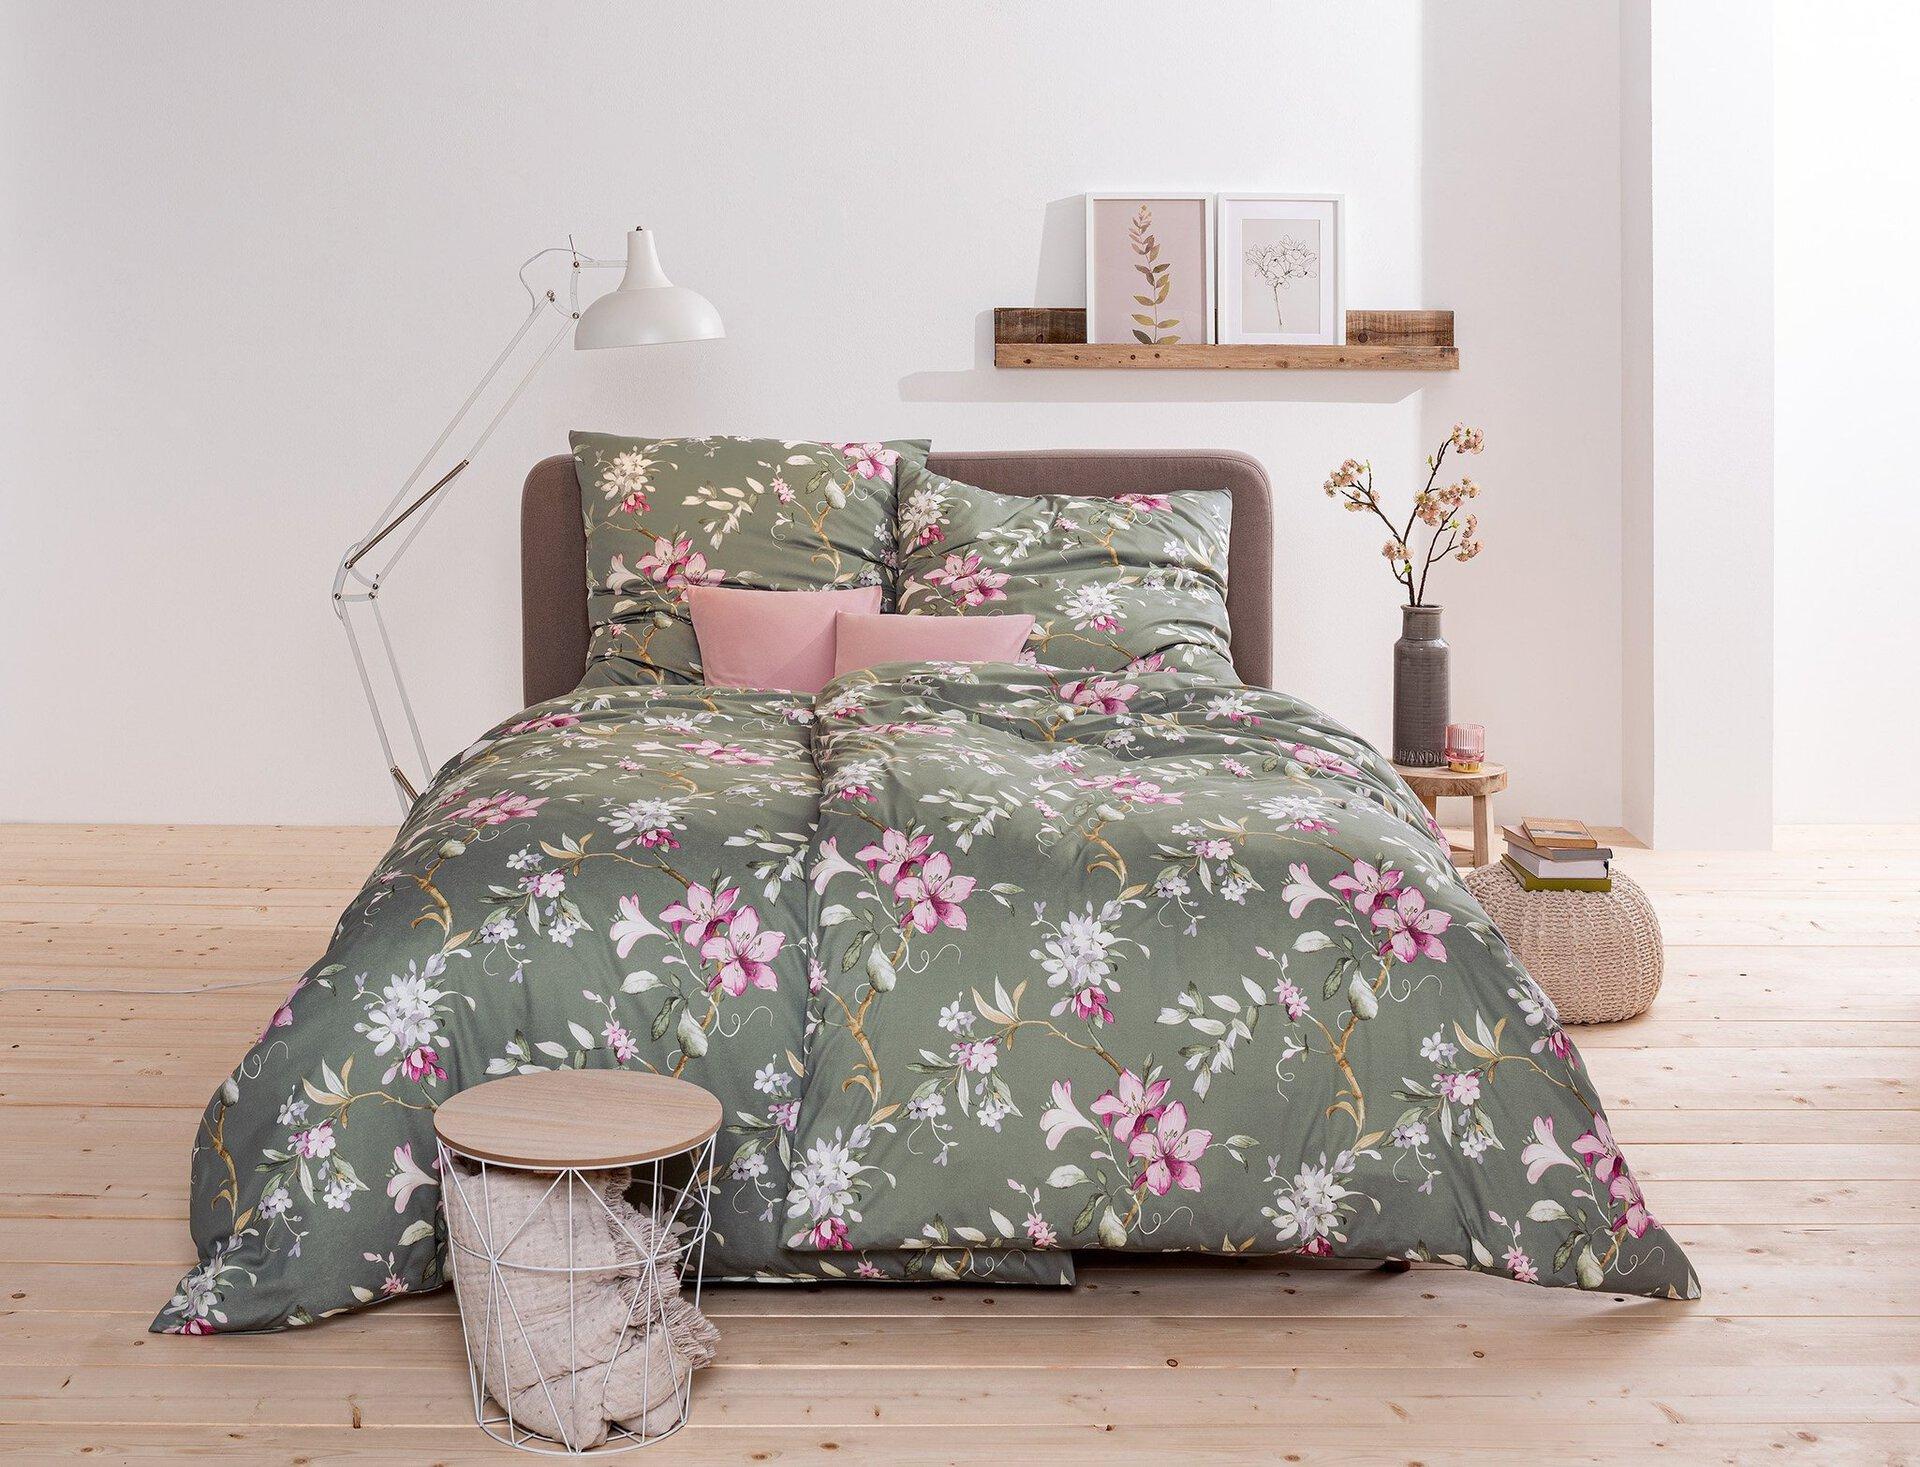 Jersey-Bettwäsche Liliana Estella Textil grün 1 x 2 cm